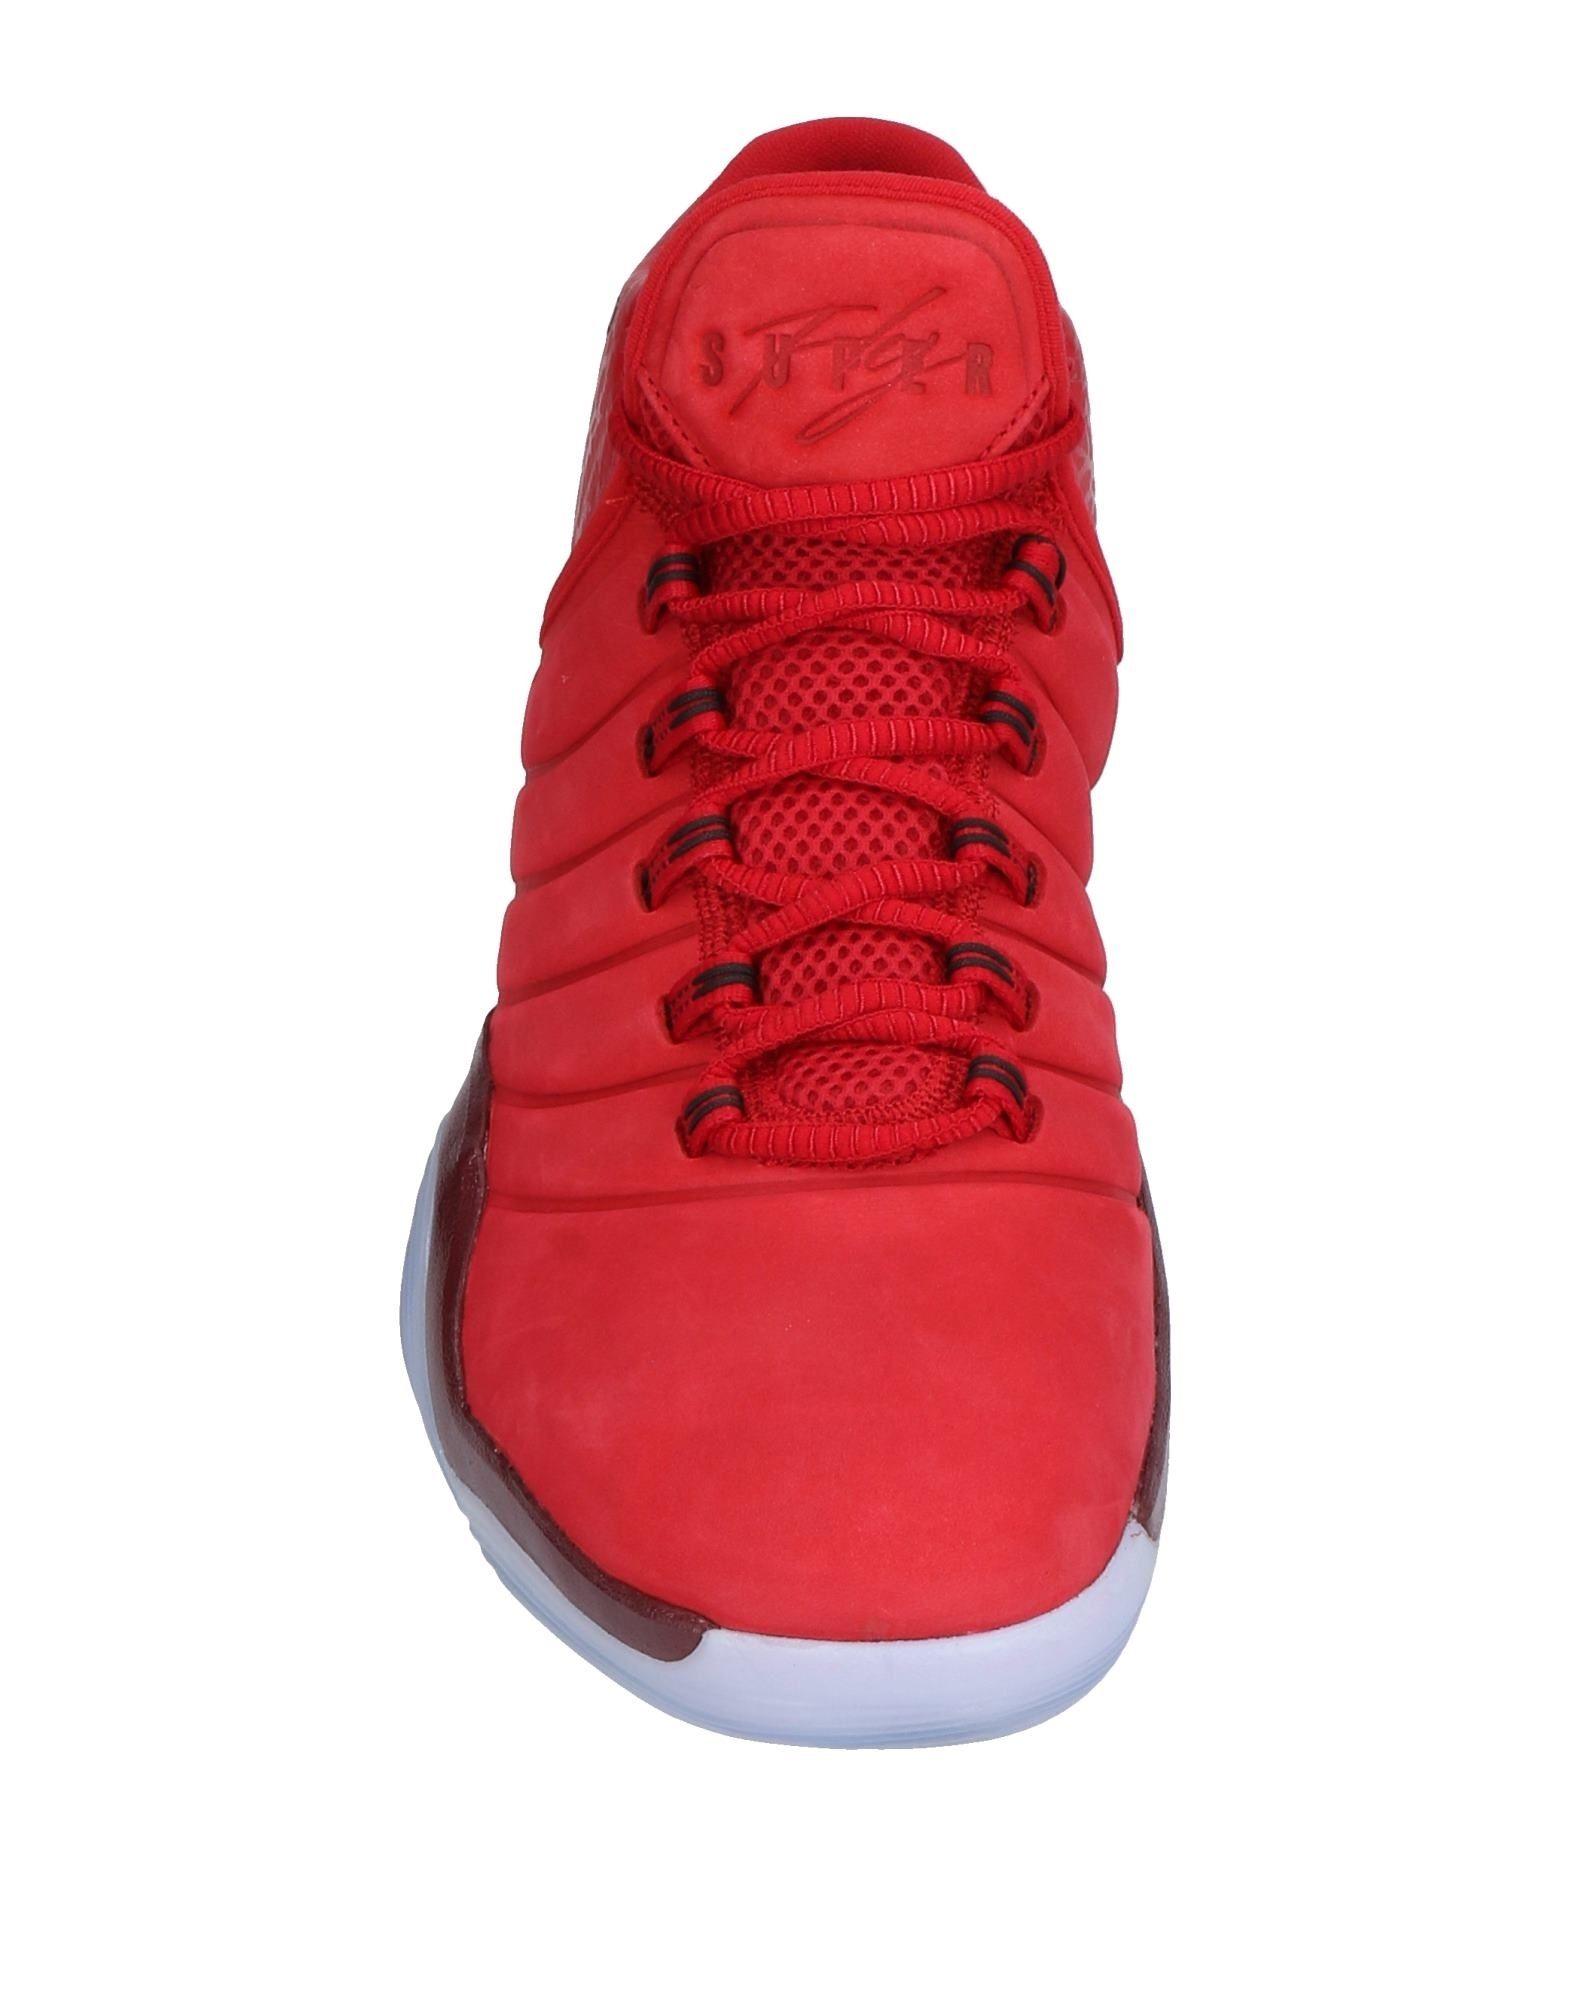 Jordan Sneakers online - Men Jordan Sneakers online Sneakers on  Australia - 11482450XN 6737bd